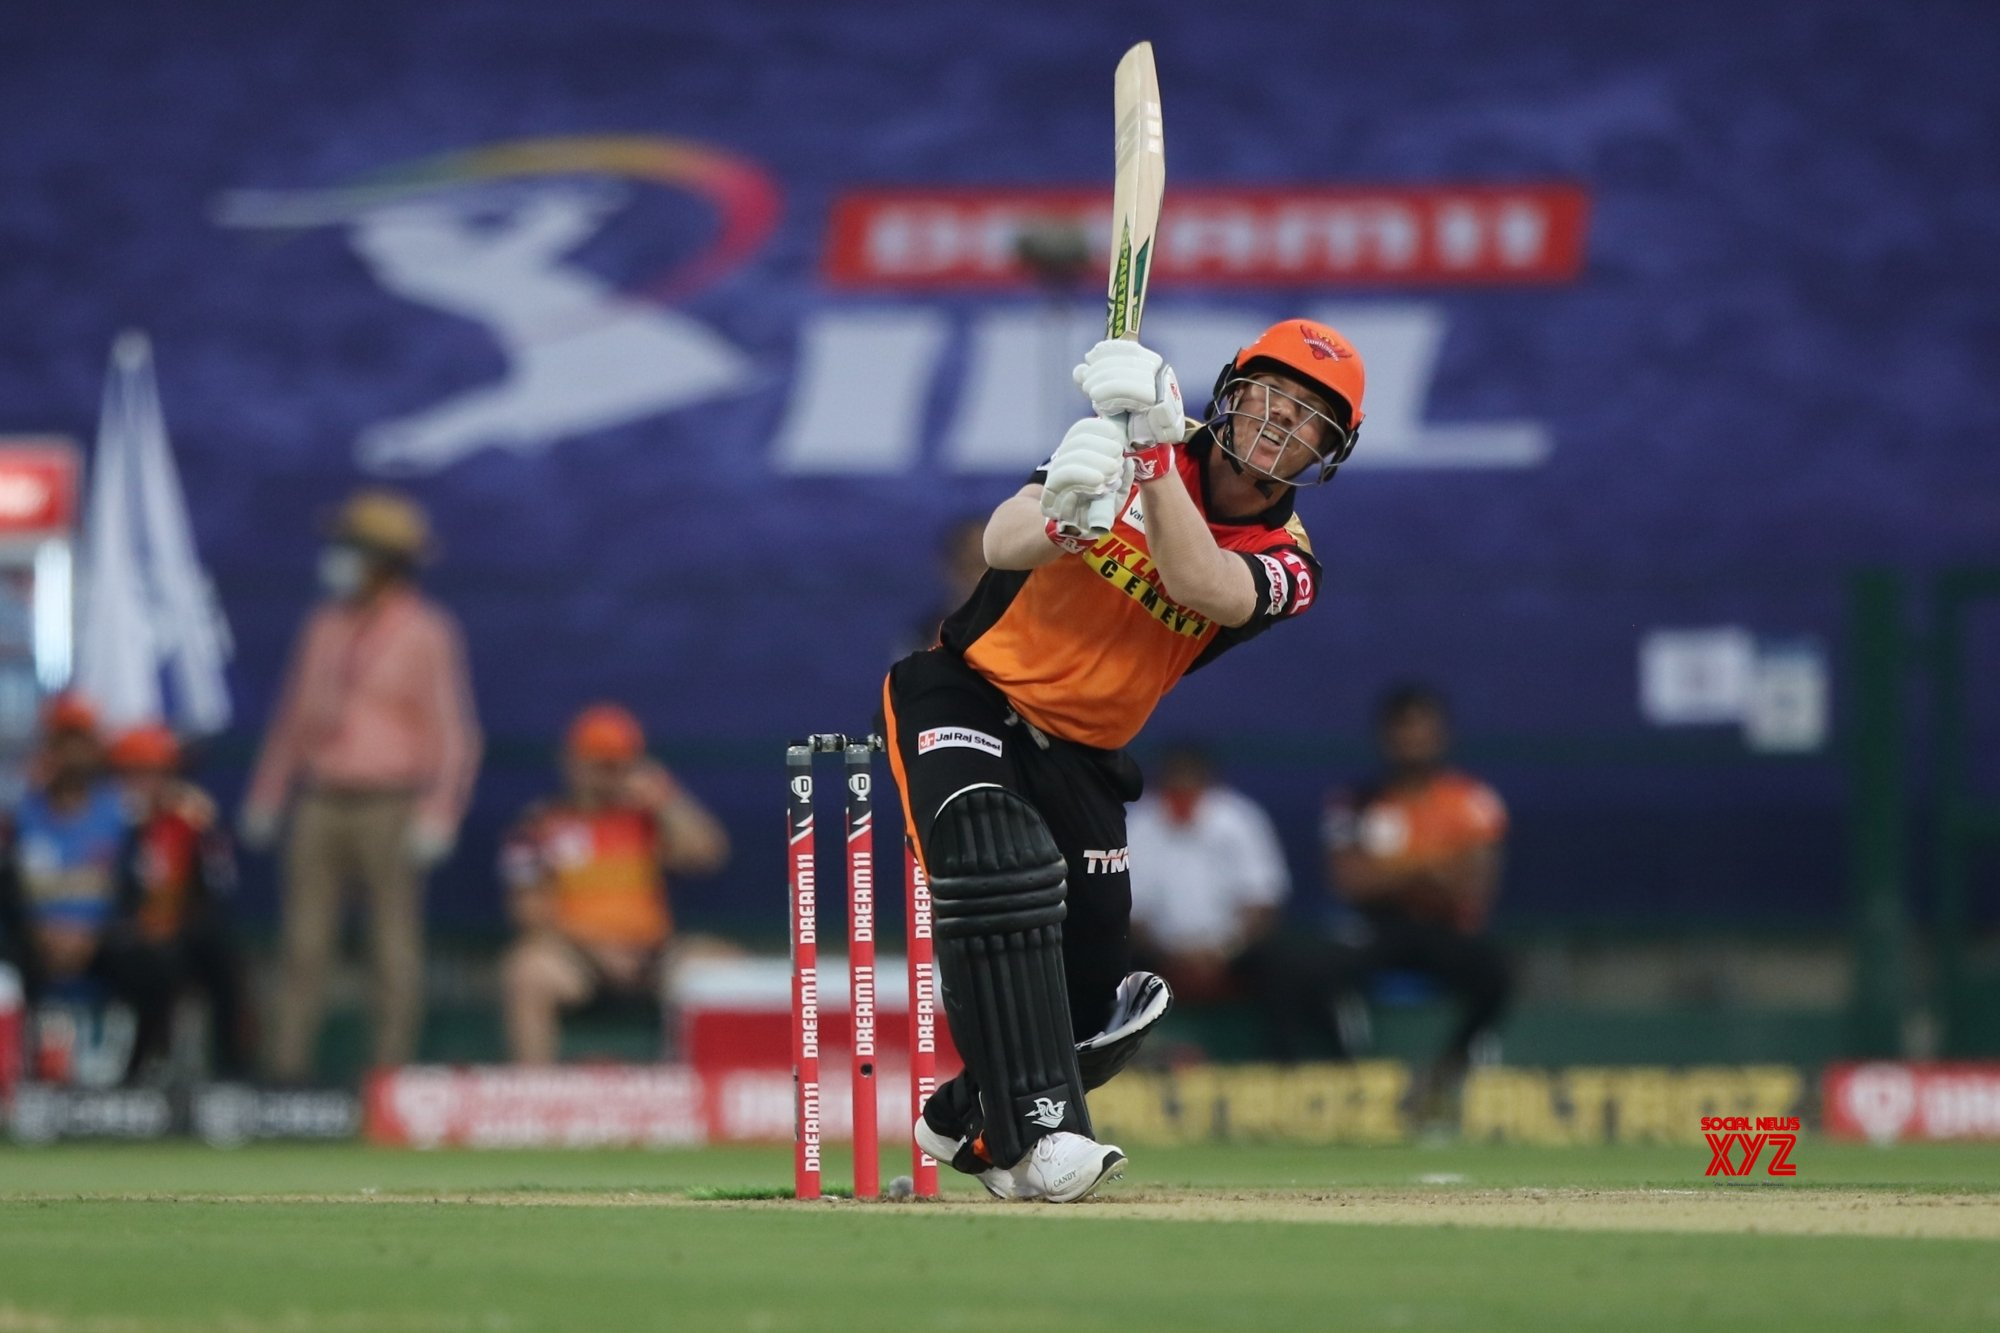 IPL Match 35: SRH elect to bowl against KKR